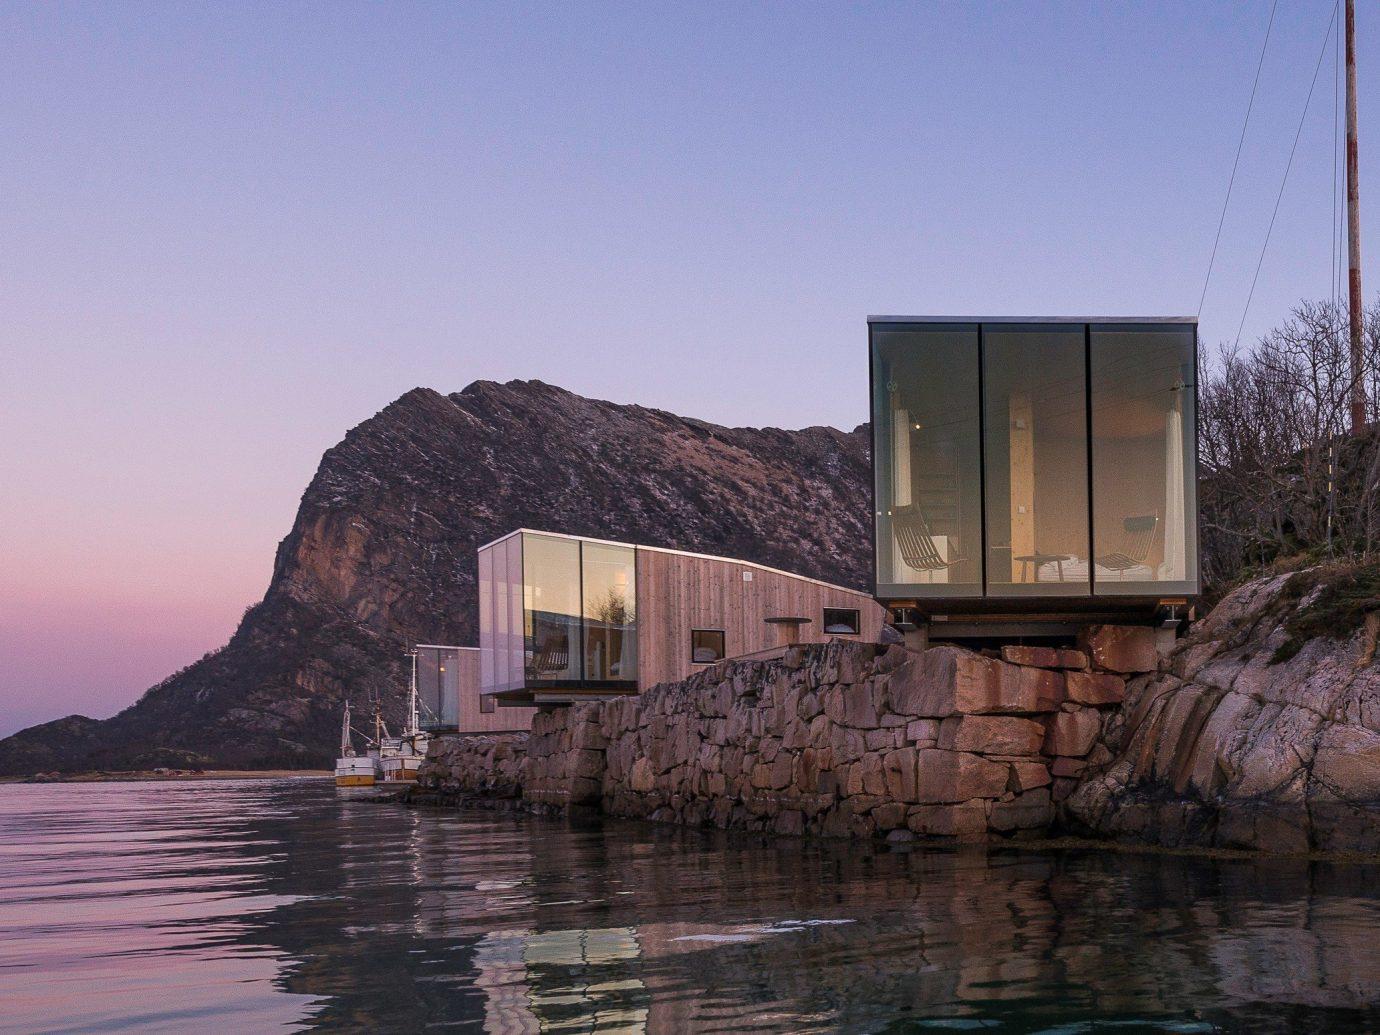 Norway Oslo Trip Ideas Architecture reflection house sky Sea water real estate building Coast evening Villa facade cottage